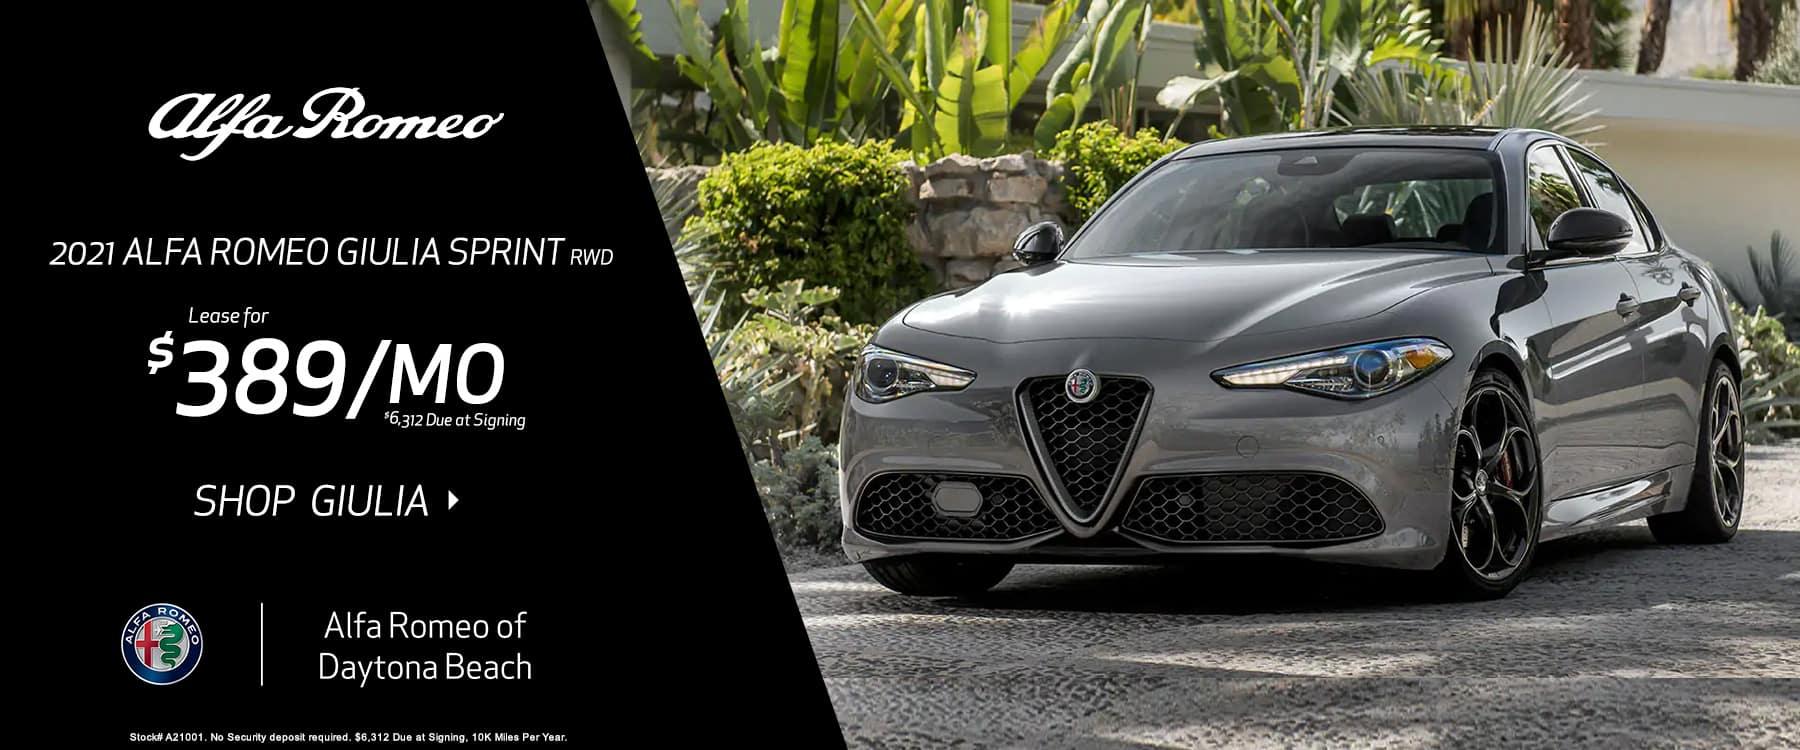 DMAR-2109-Alfa-Romeo-1800×750-01